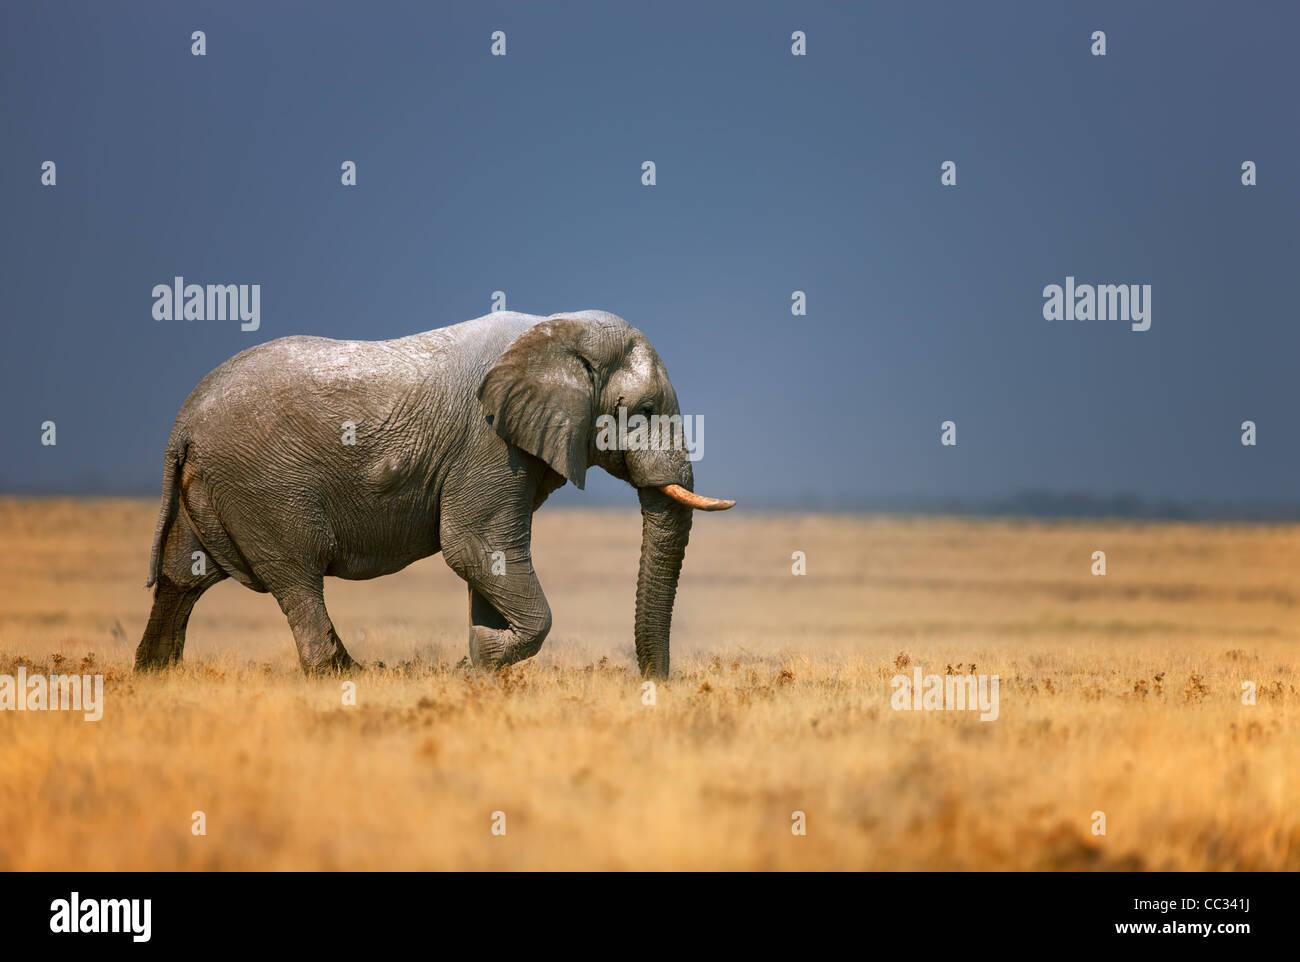 Bull elefante caminando en abrir grassfield; Loxodonta Africana; Etosha Imagen De Stock